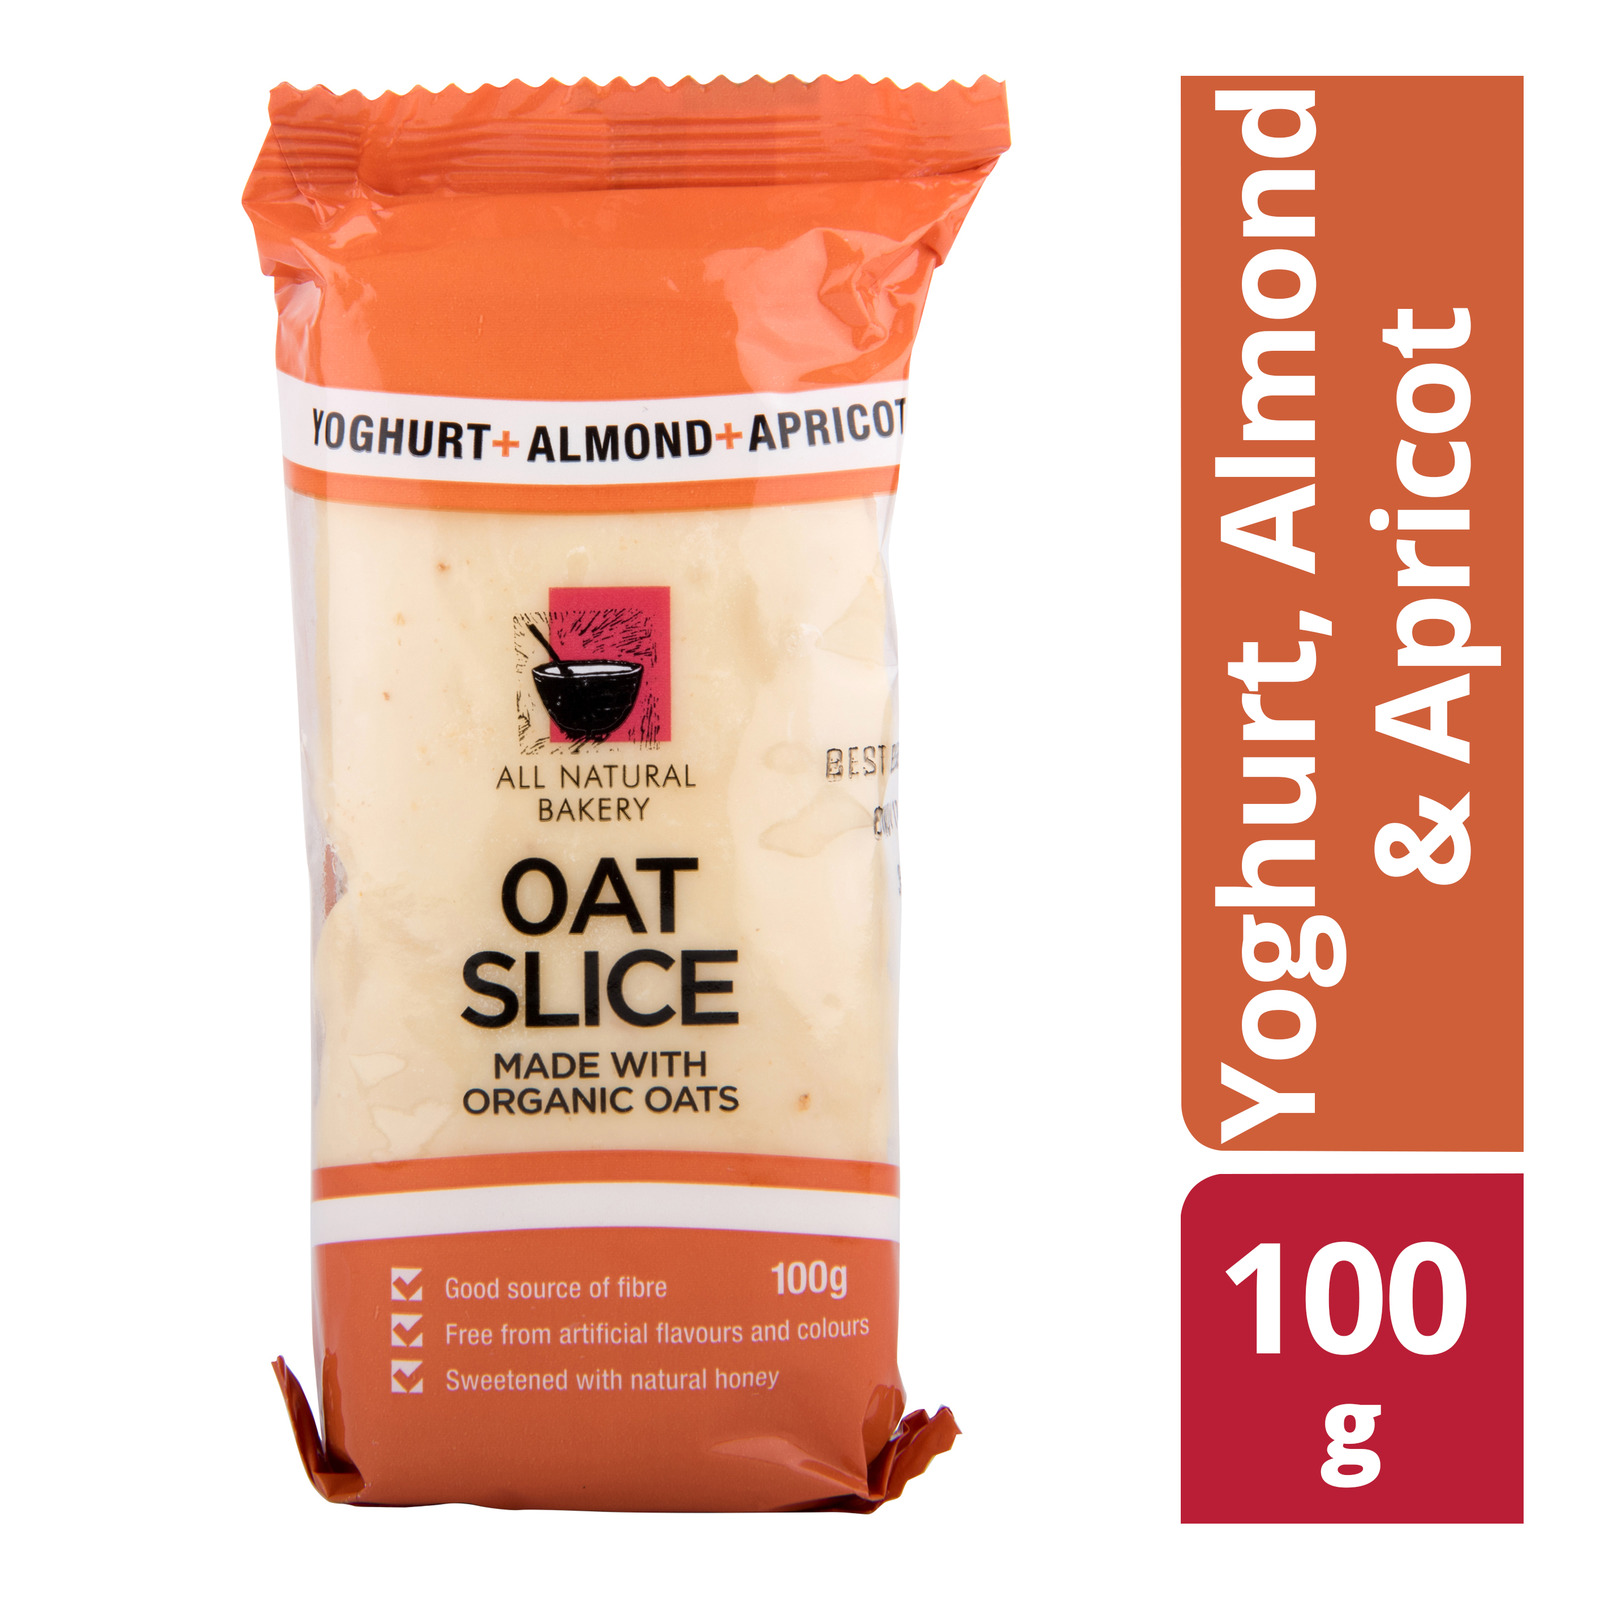 All Natural Bakery Oat Slice - Yoghurt, Almond & Apricot